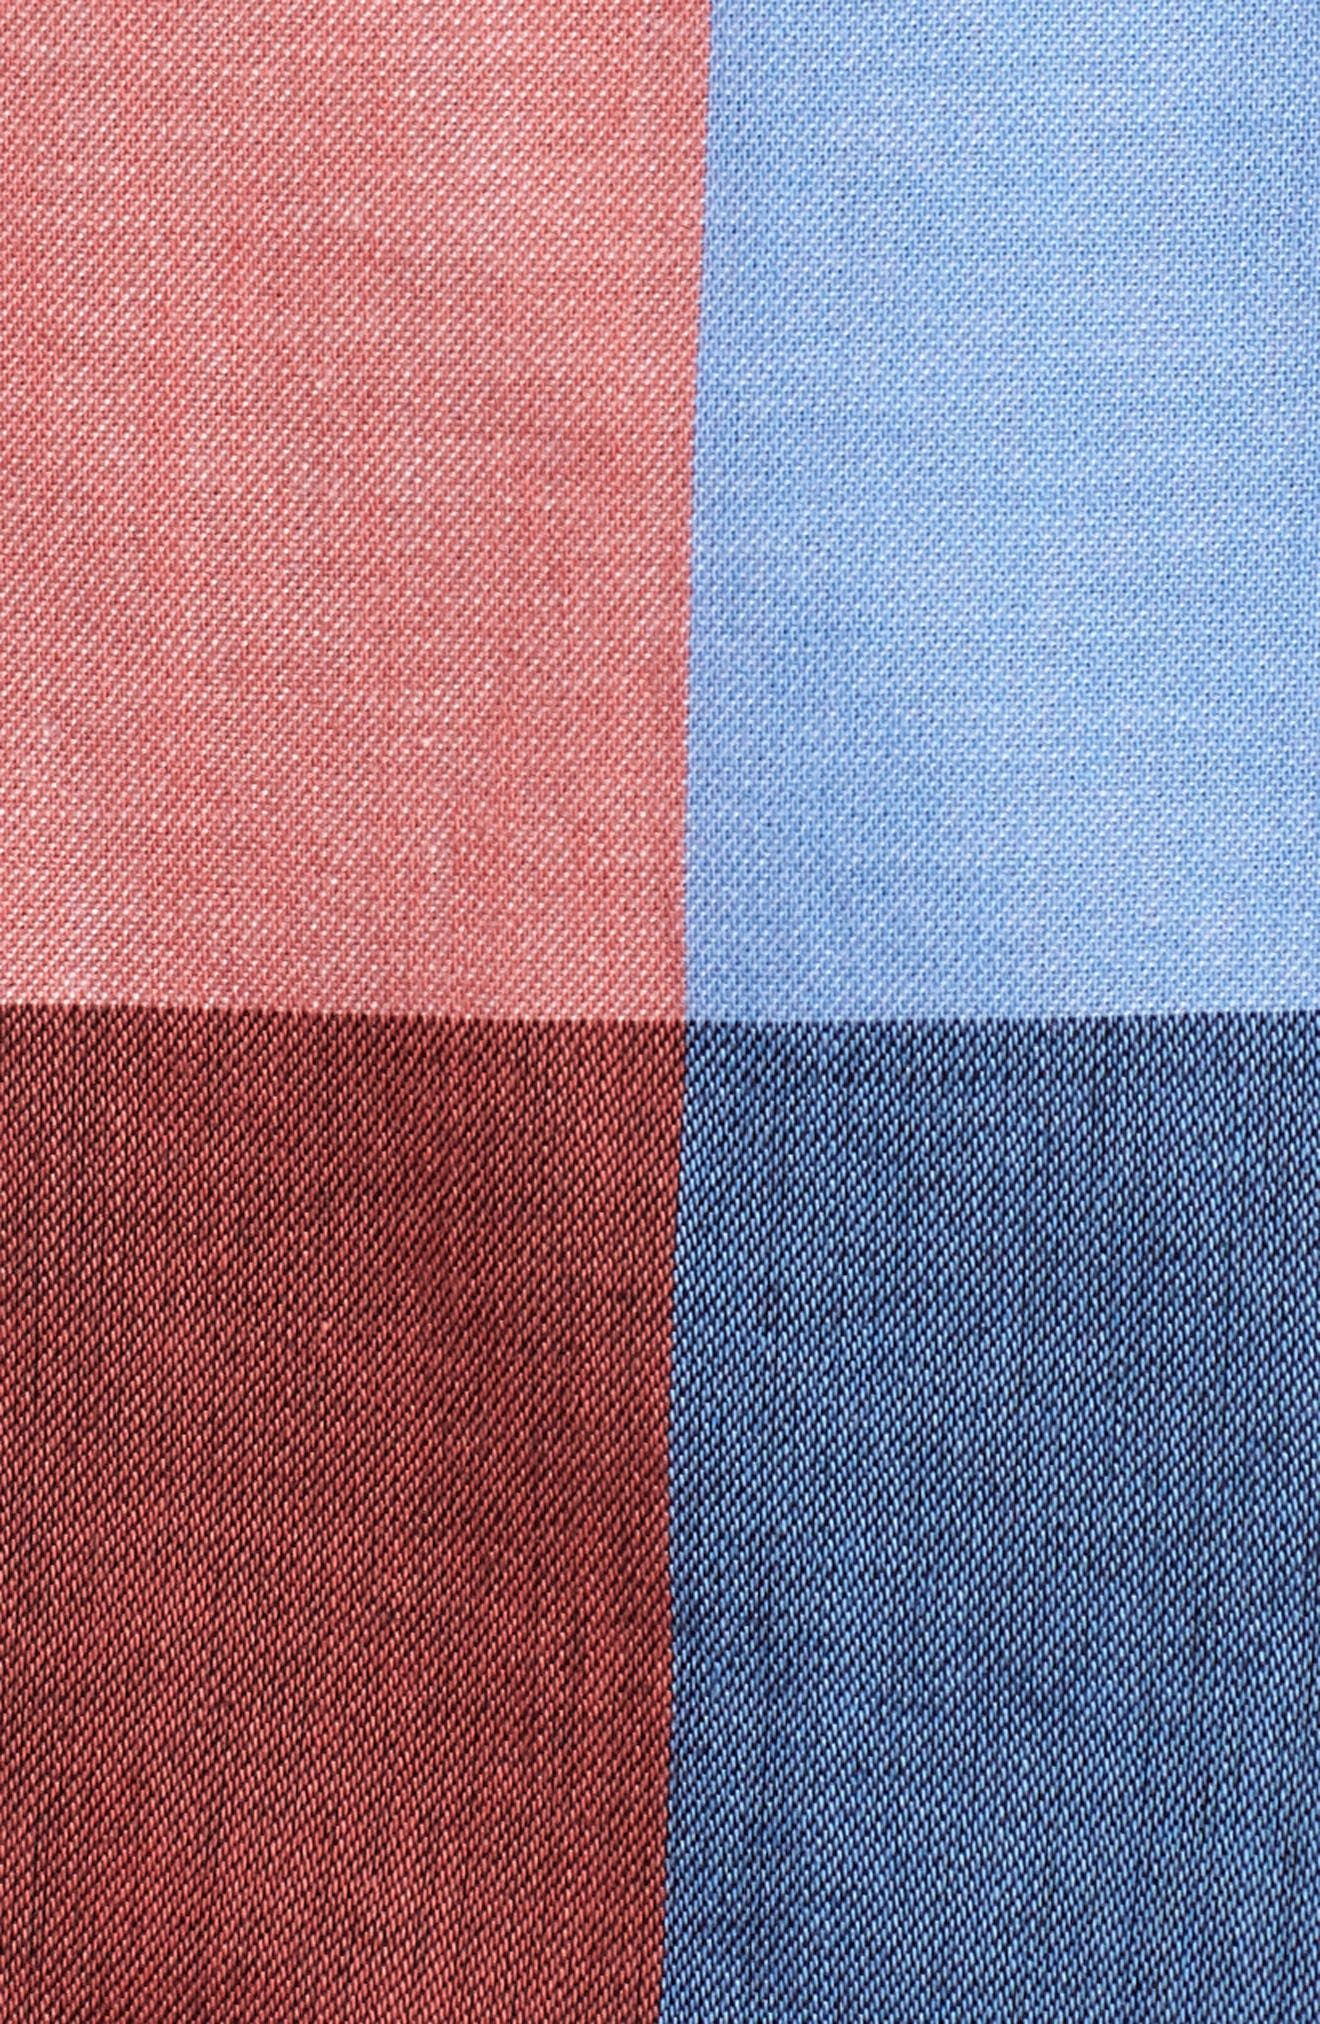 Double Breasted Plaid Cotton Blazer,                             Alternate thumbnail 6, color,                             Pink- Blue Plaid